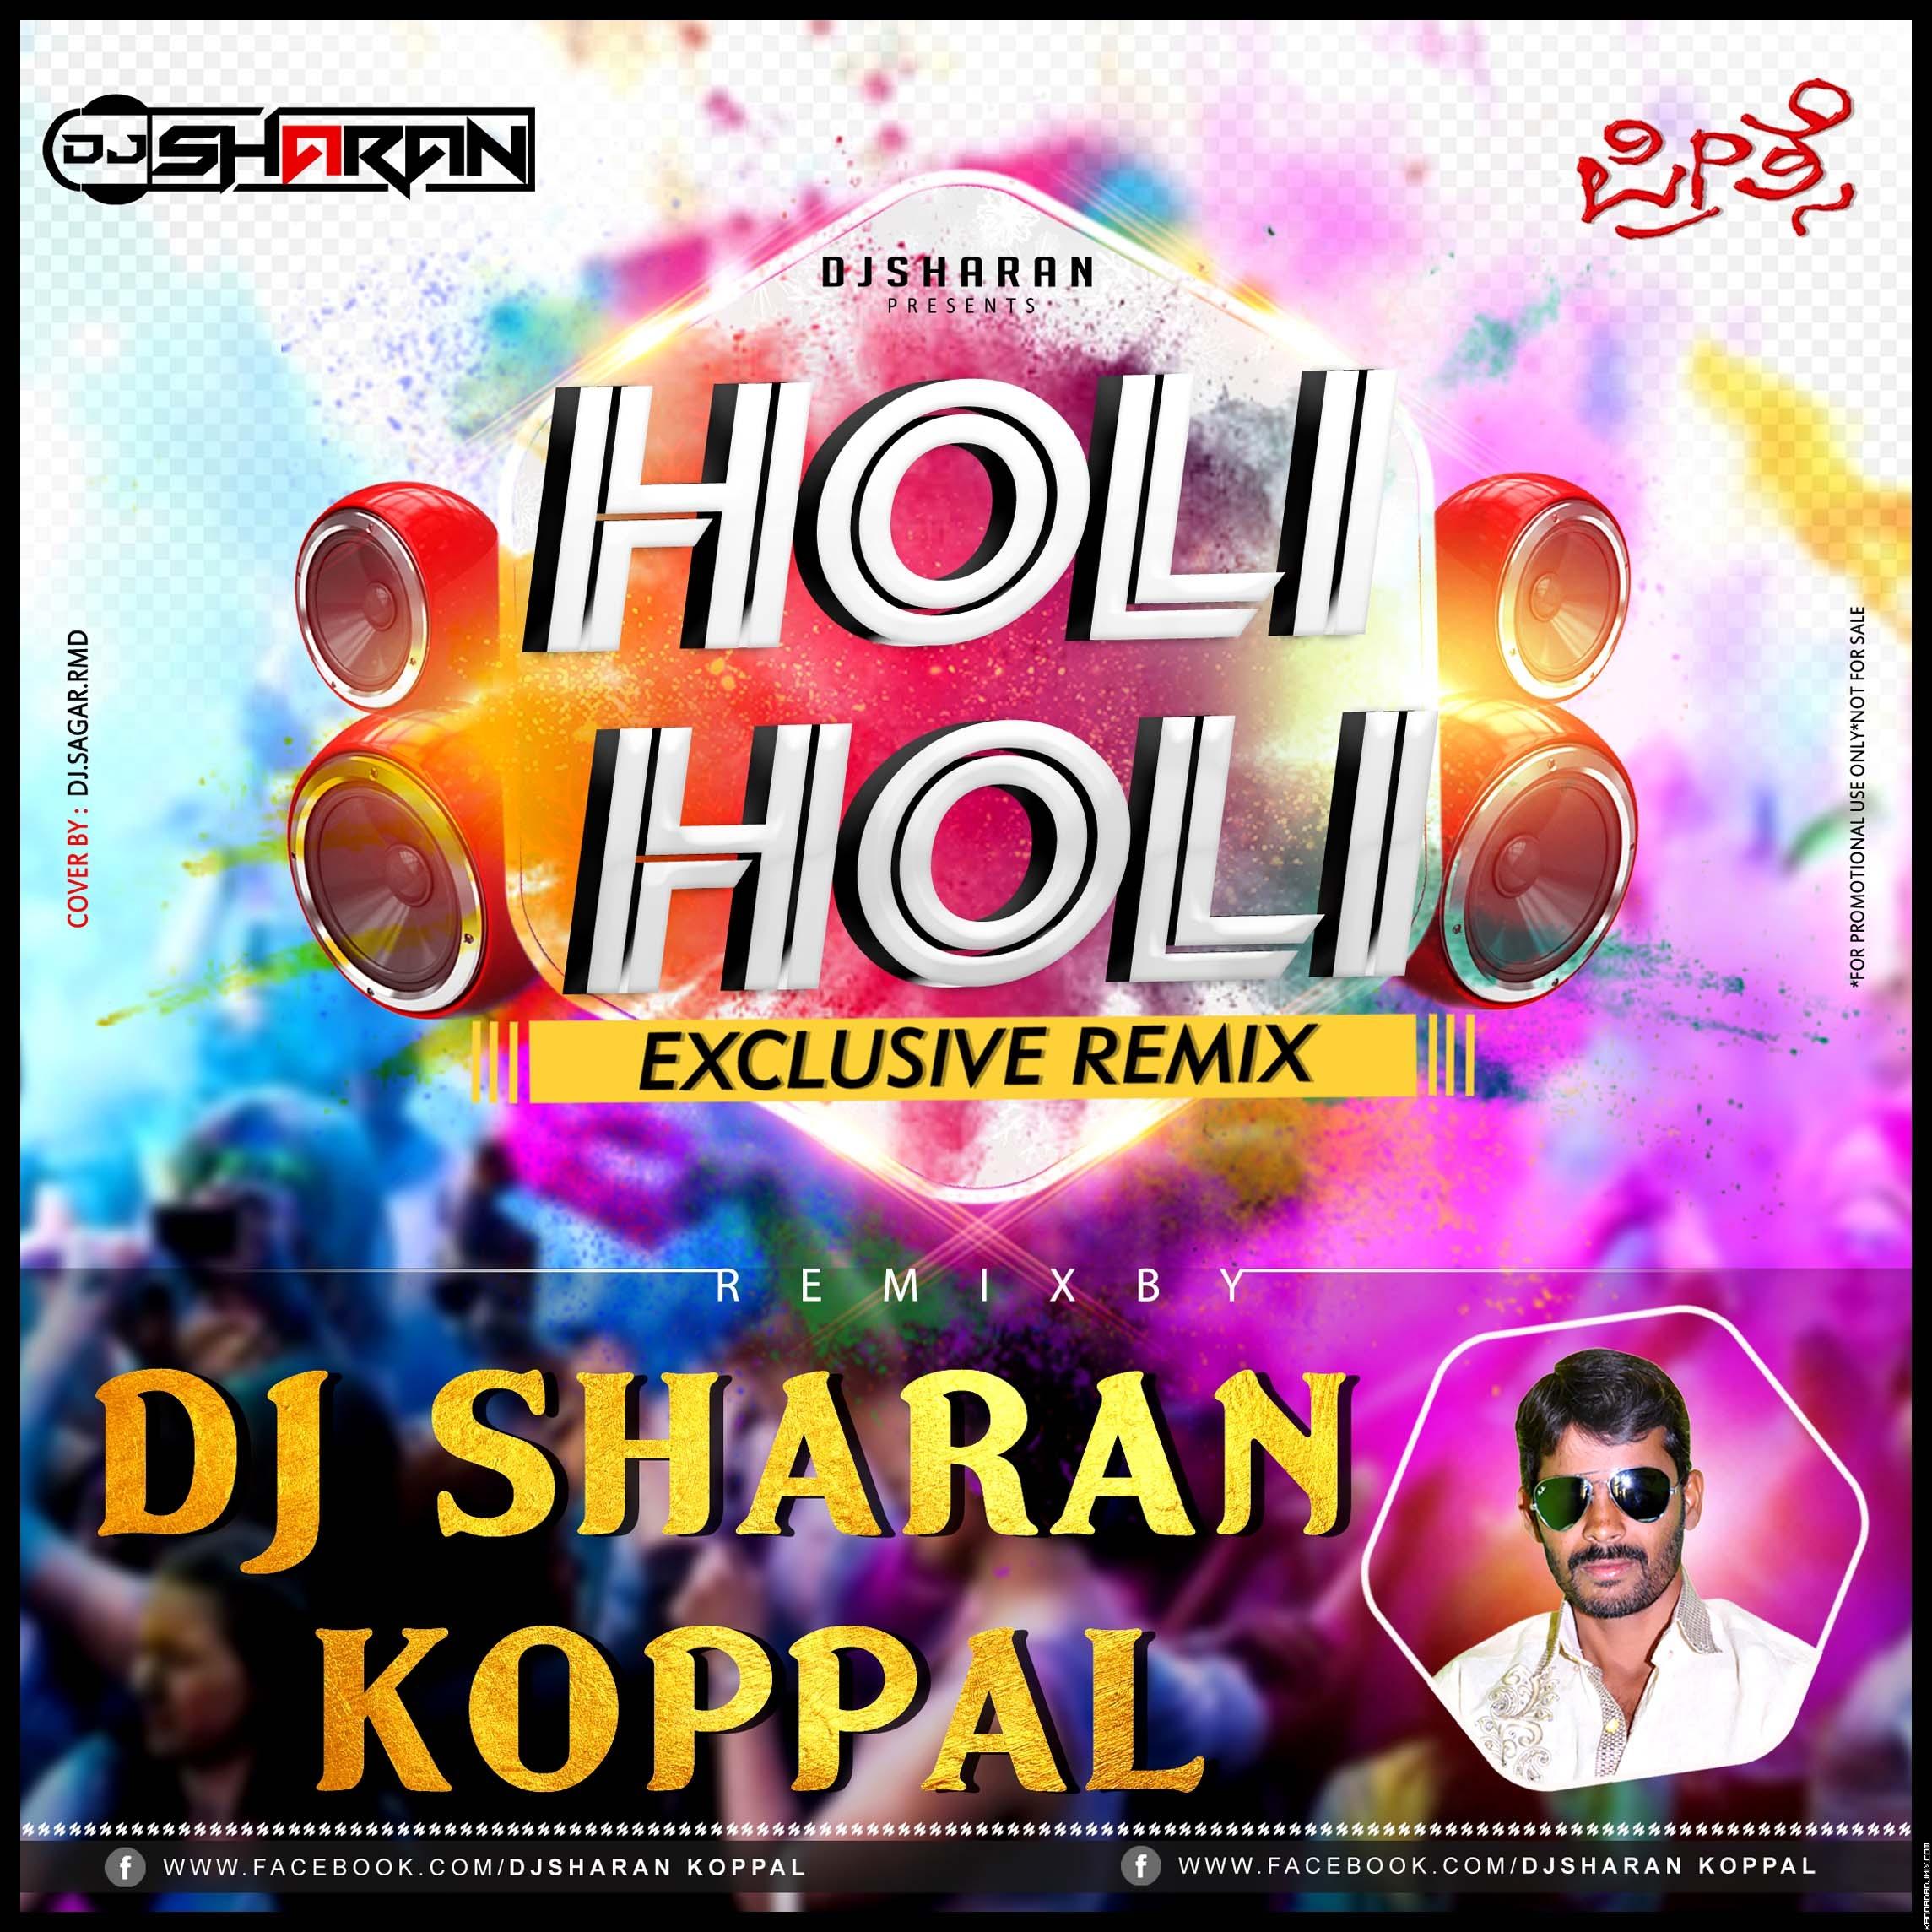 _01._HOLI_HOLI_(PREETSE)_DJ_SHARAN KOPPAL_REMIX.mp3